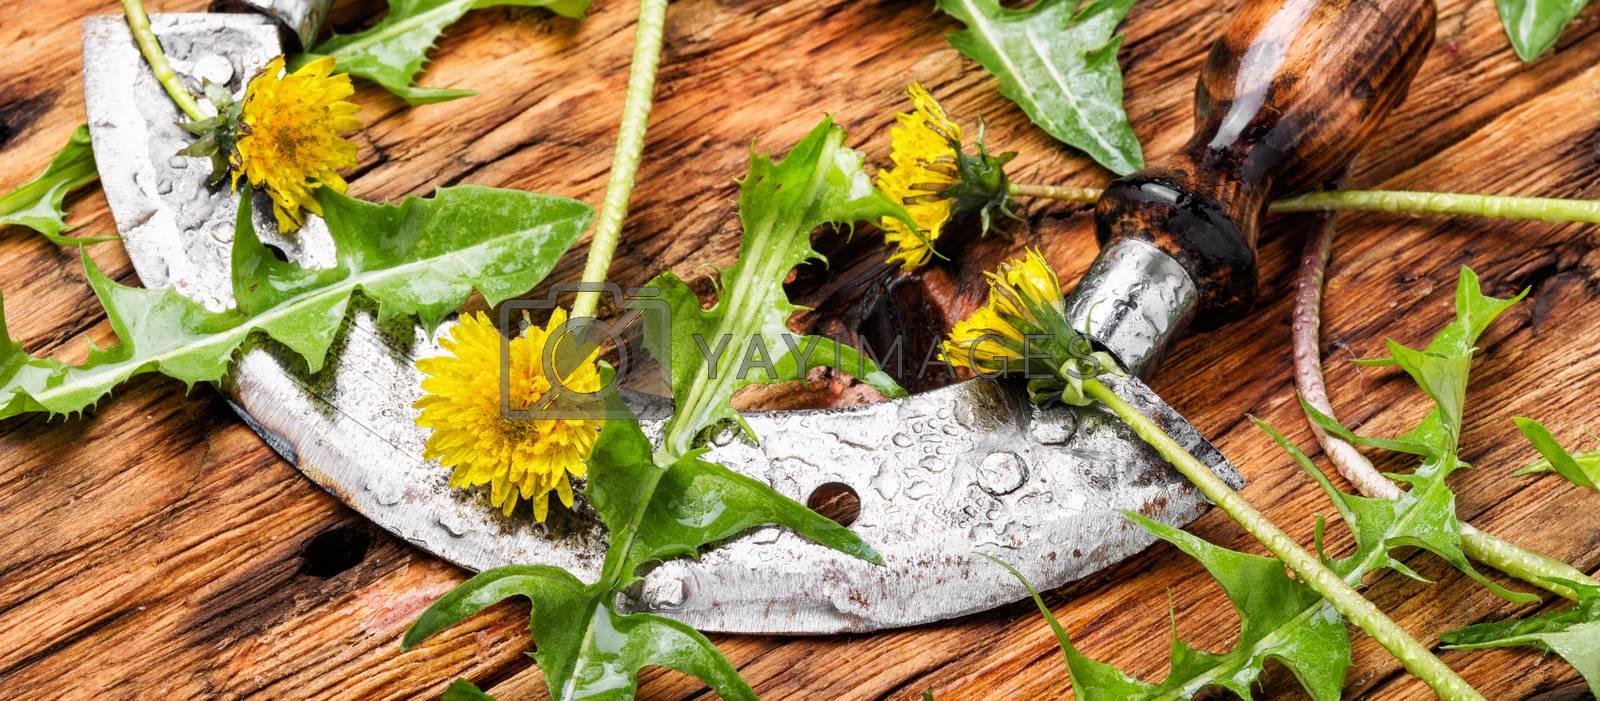 Dandelion plant on table by LMykola